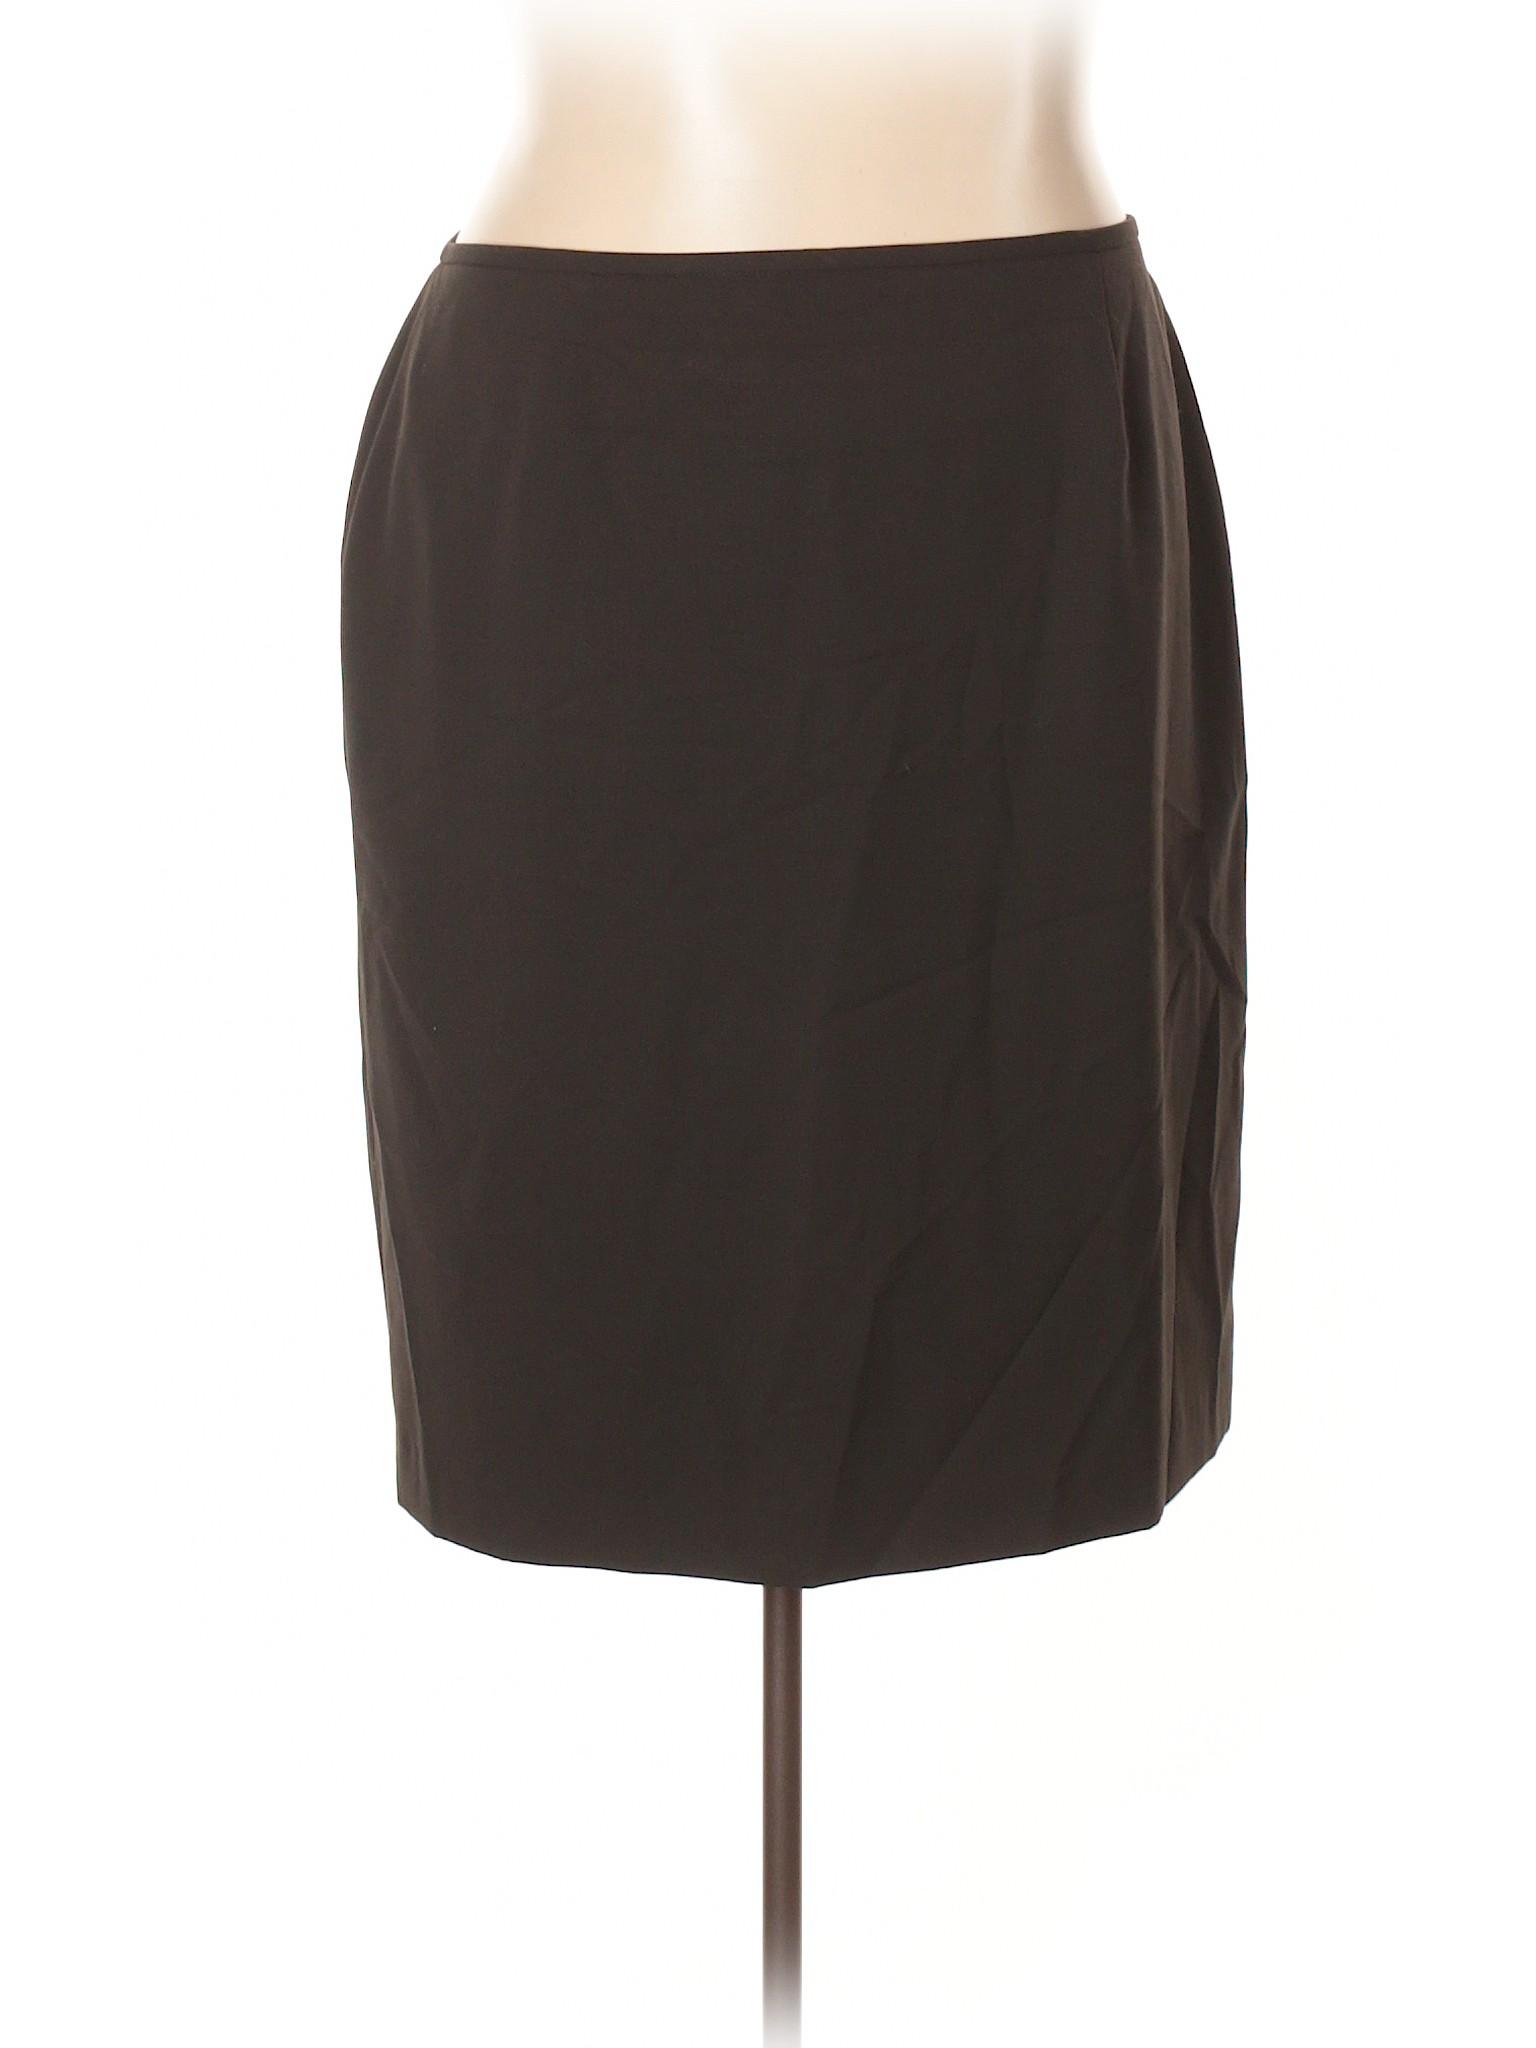 Boutique Skirt Boutique Casual Casual rqwrTS